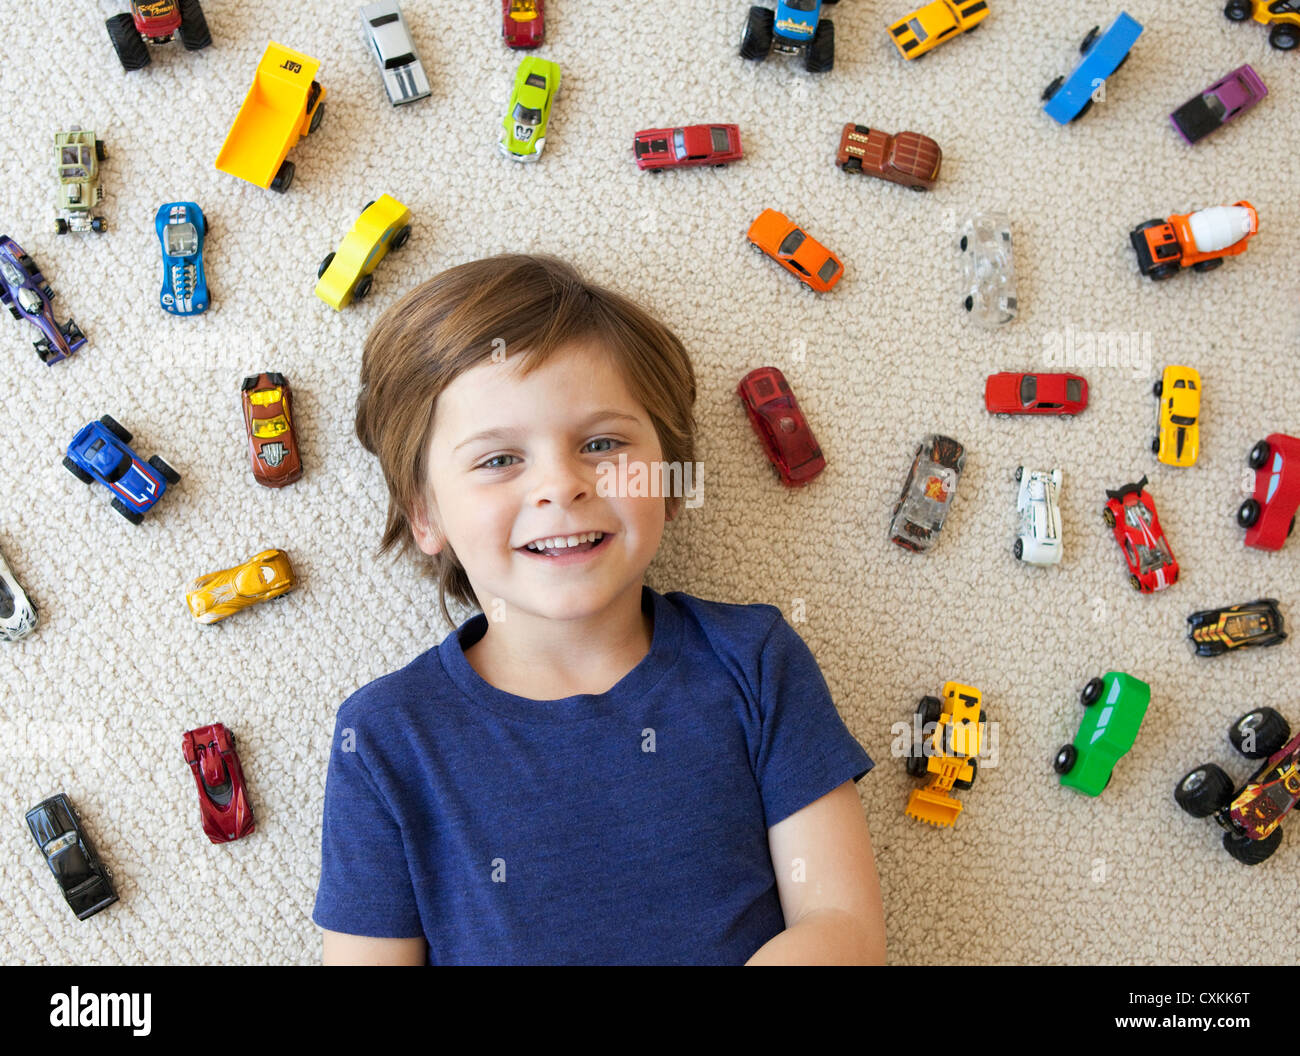 Toy cars stockfotos bilder alamy